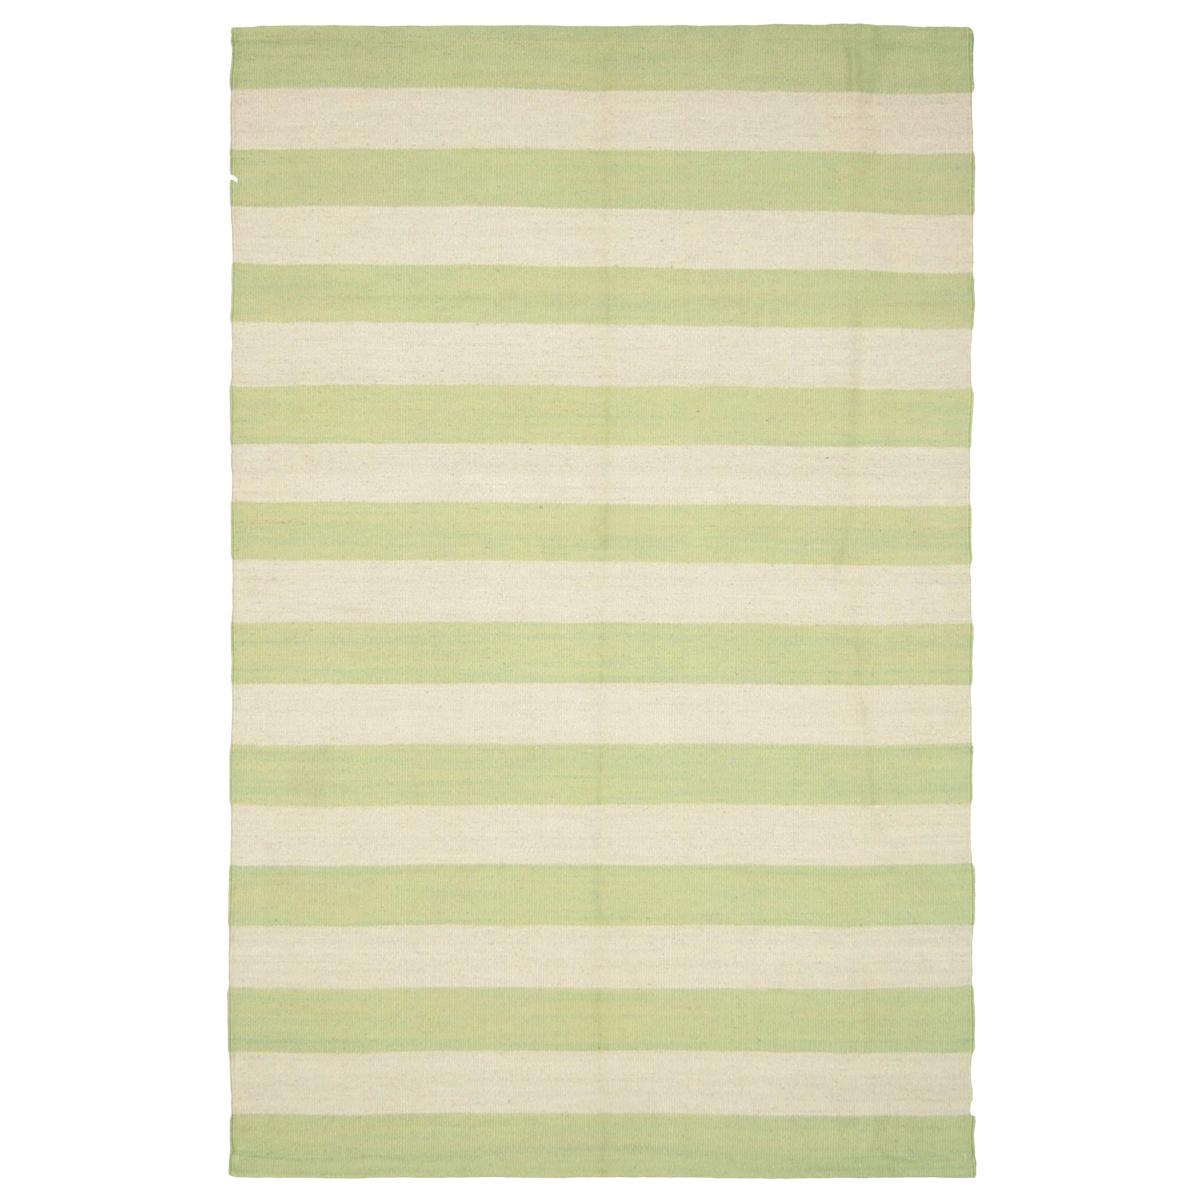 chairish green stripe rug.jpg